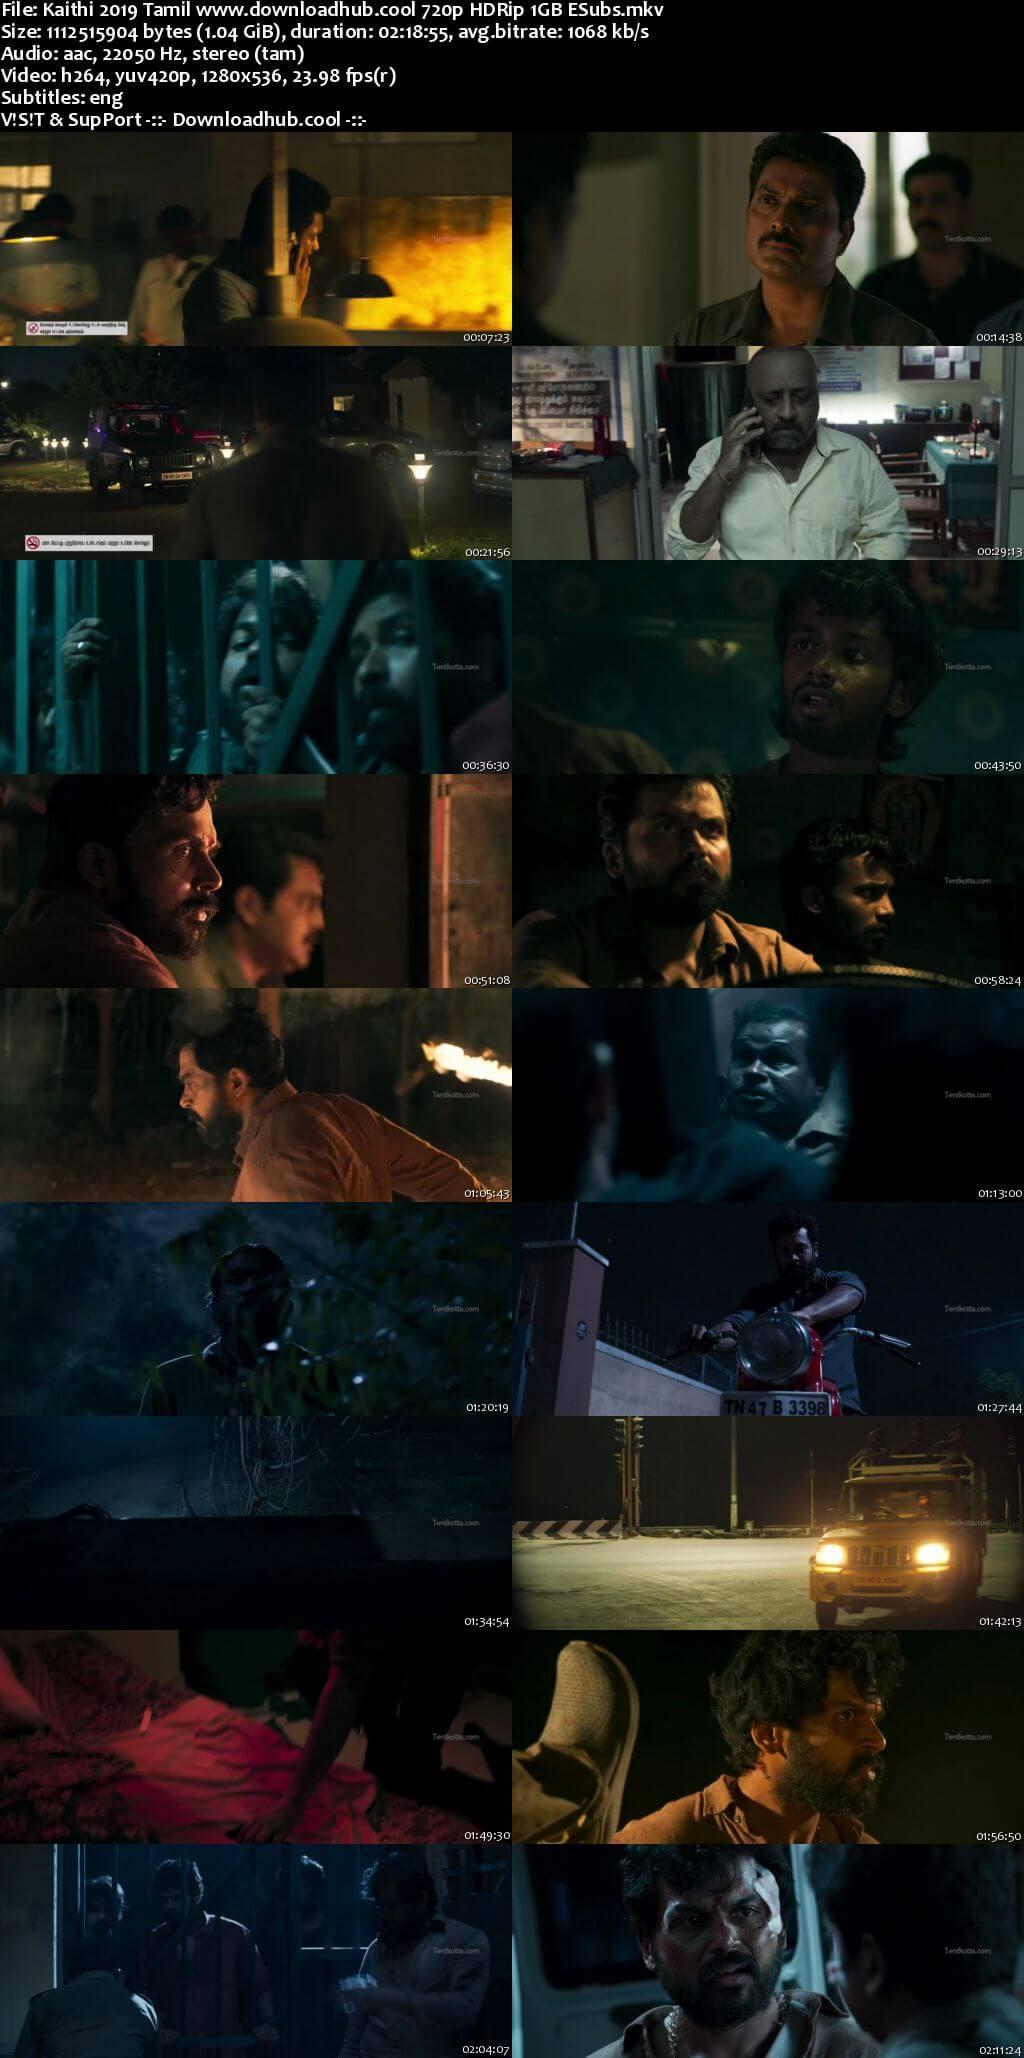 Kaithi 2019 Tamil 720p HDRip ESubs